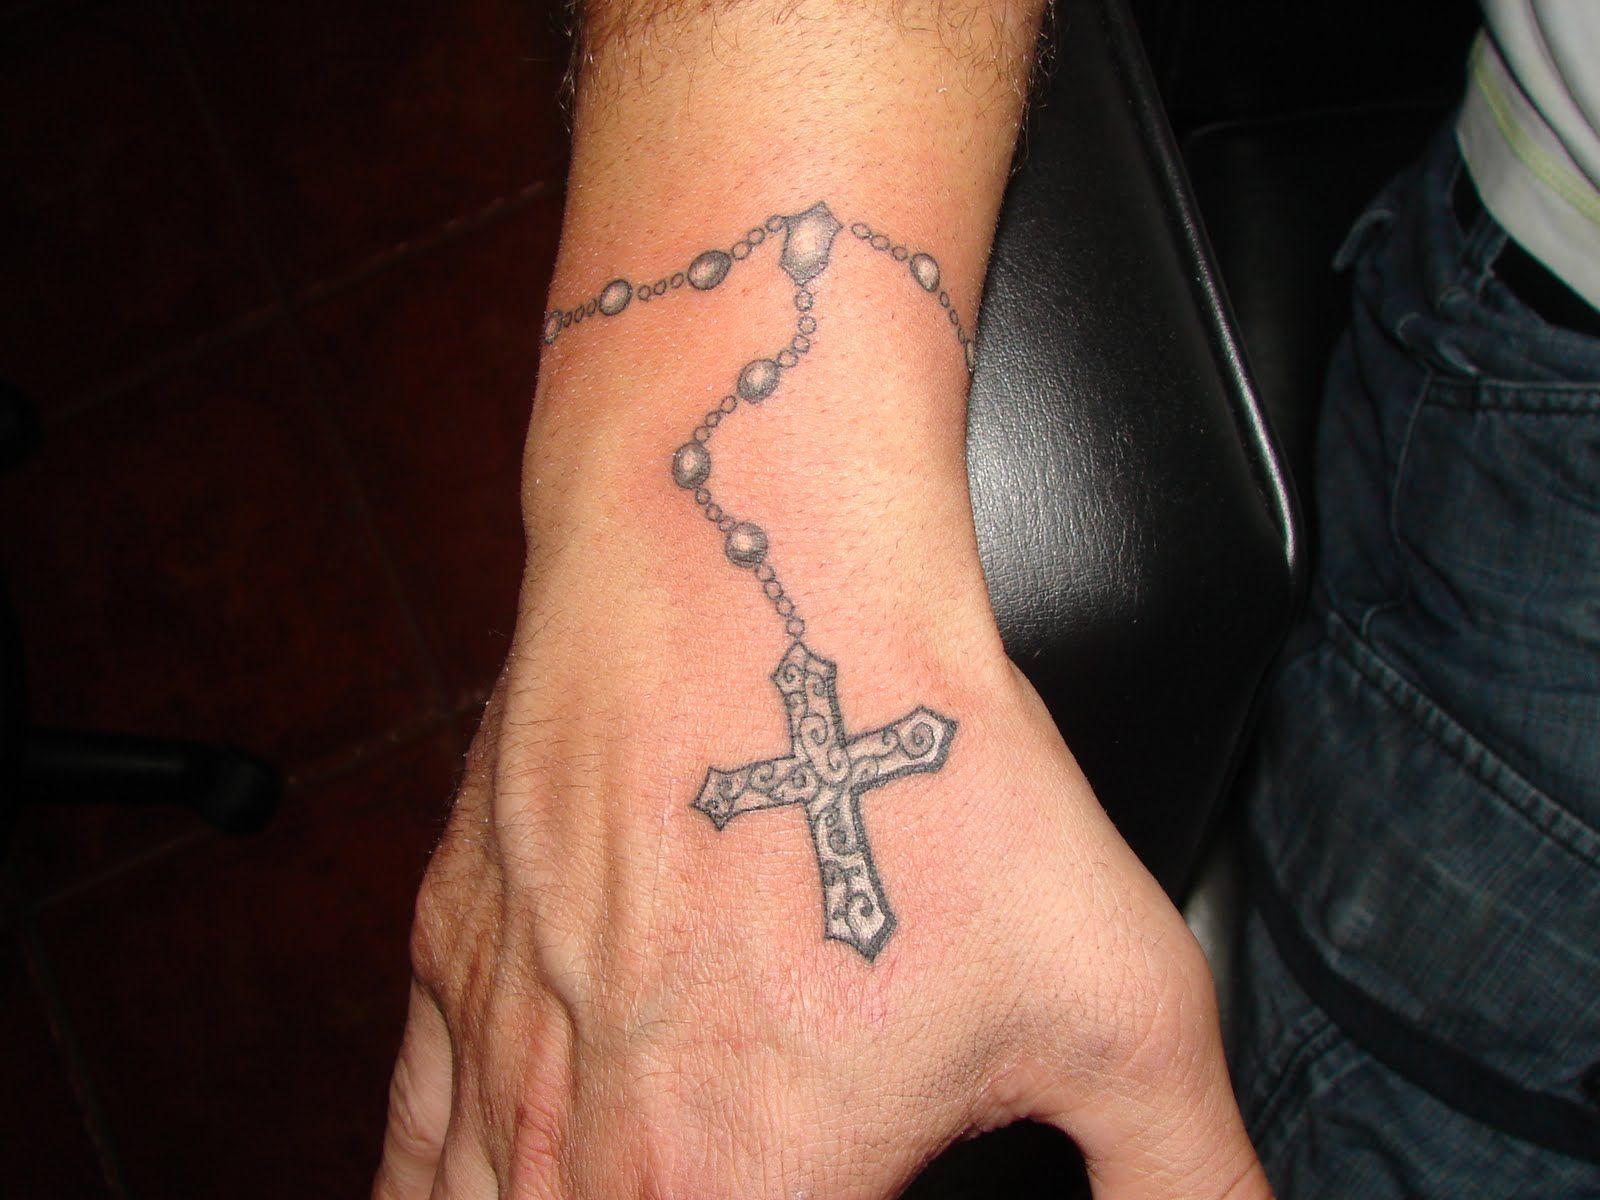 Pin by johnmull on j pinterest rosary bead tattoo tattoo and